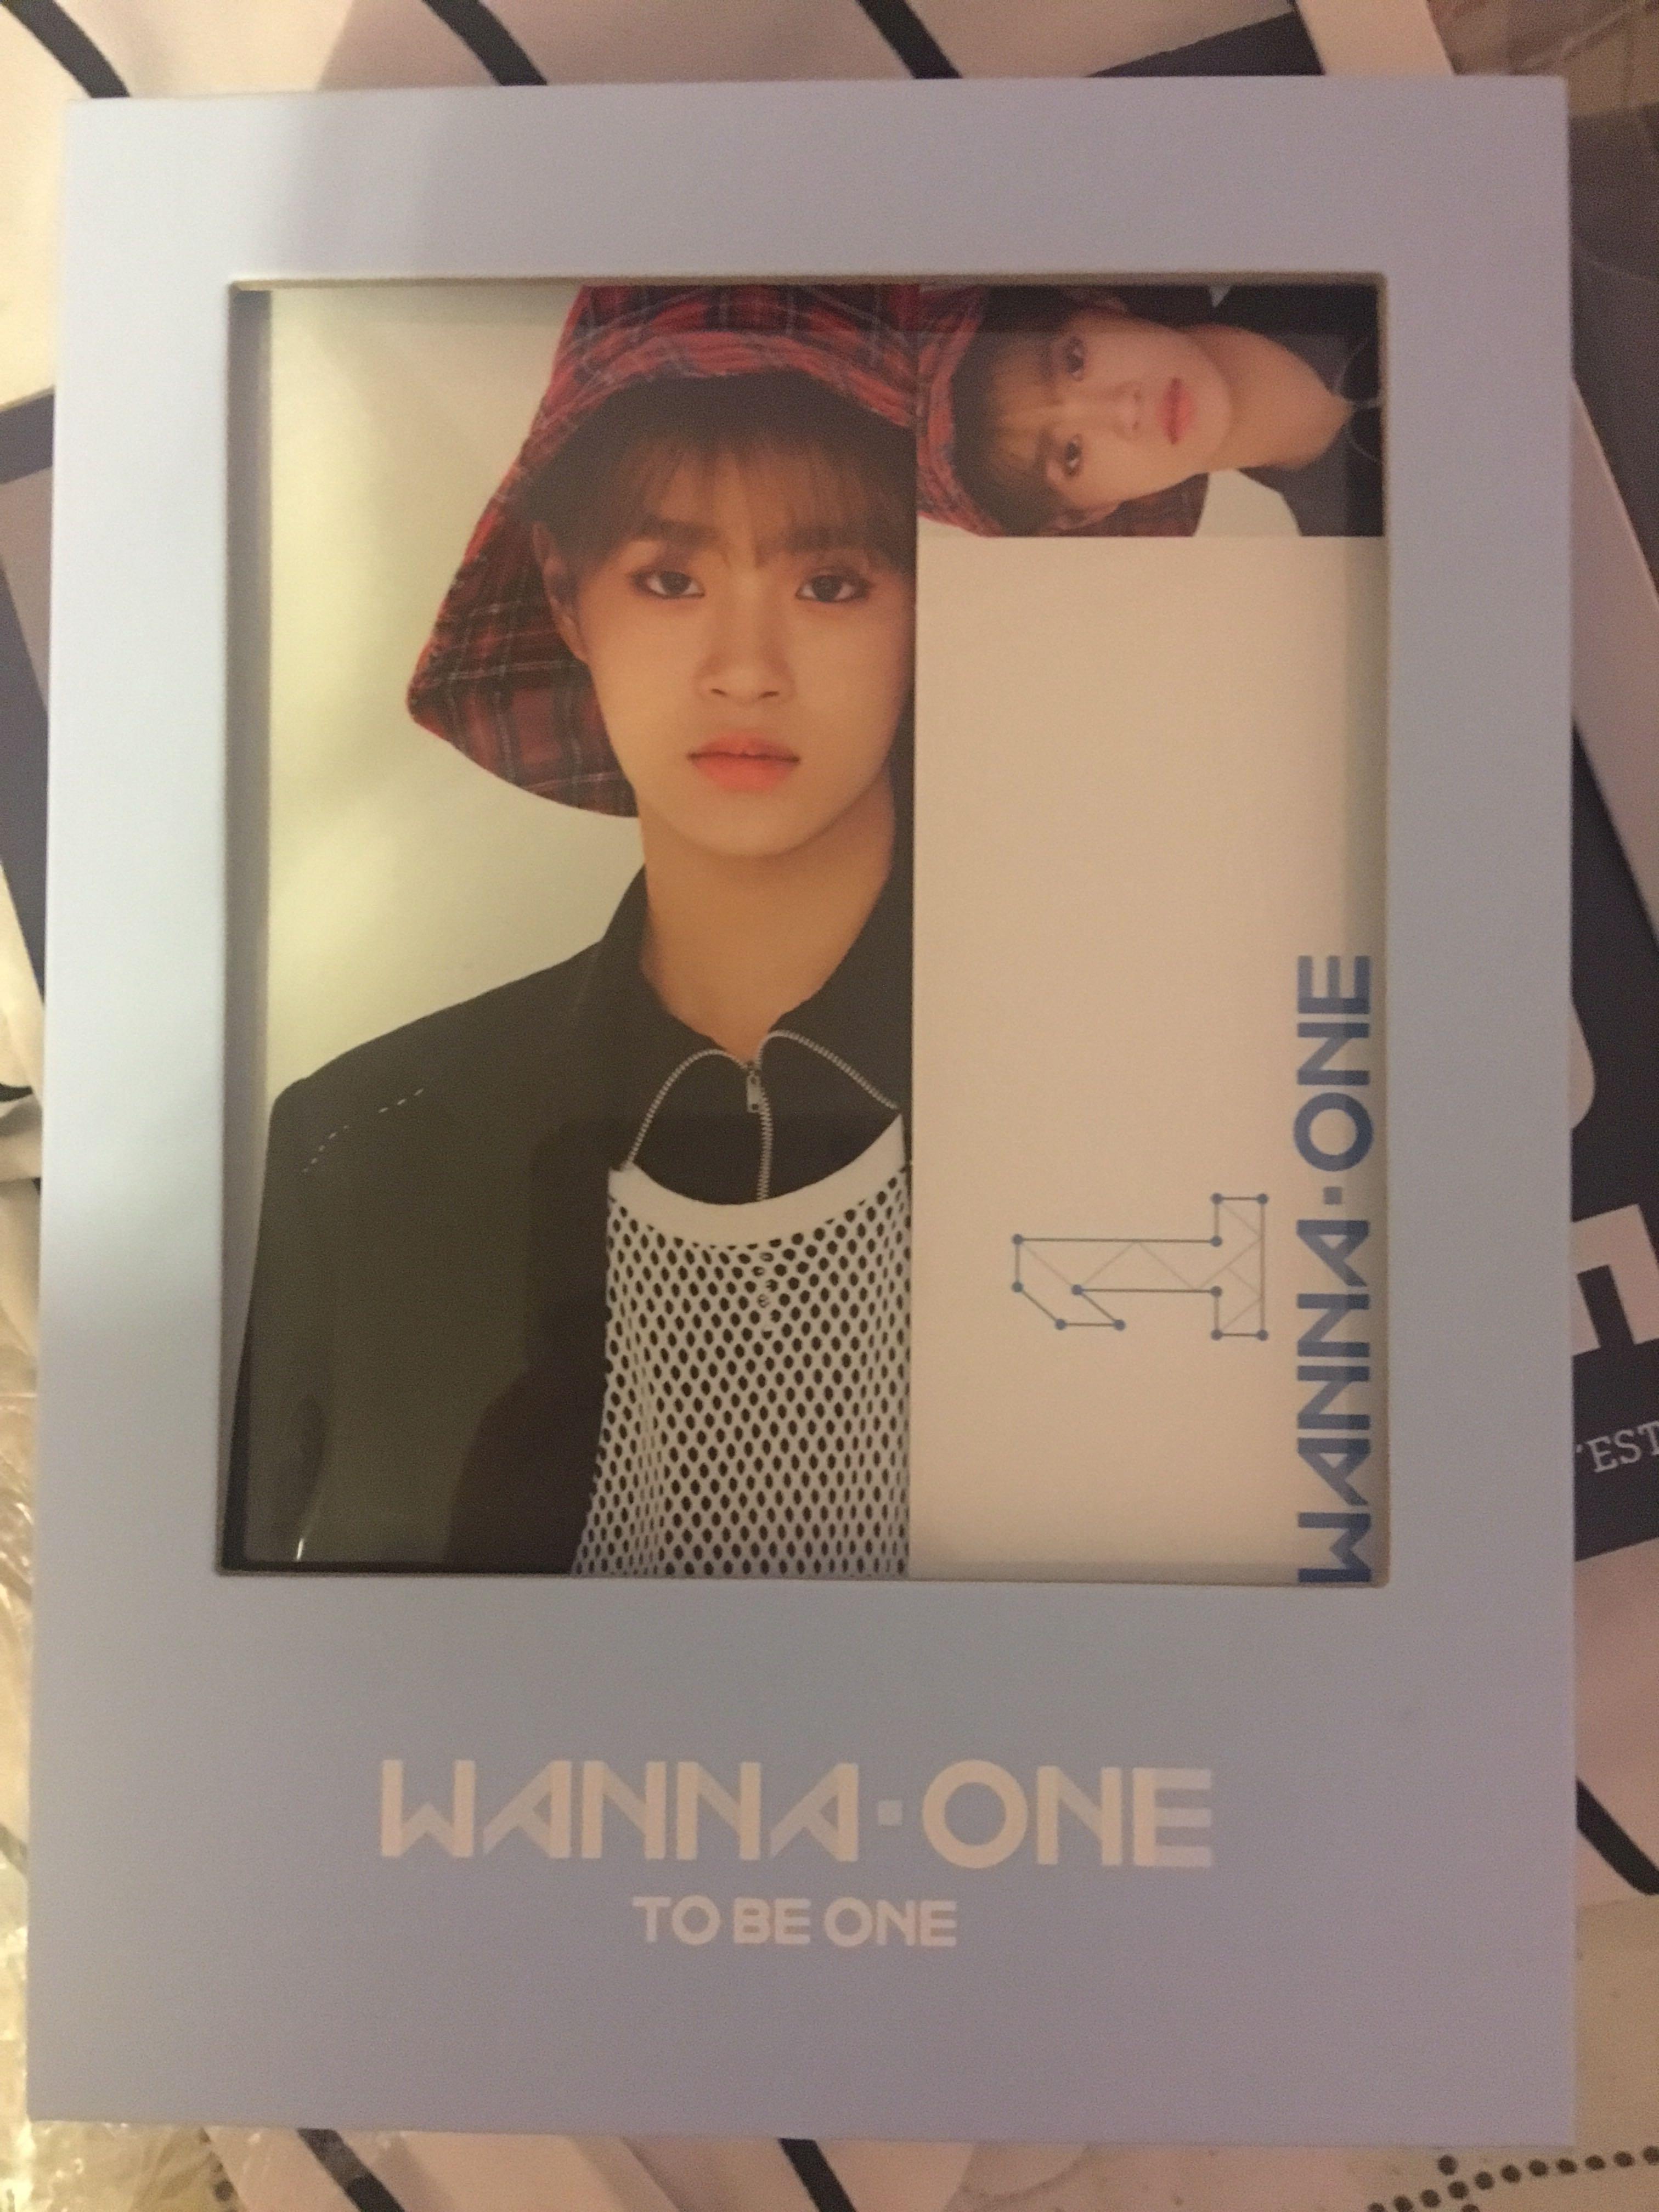 [Autographed- MWAVE] Wanna One: To Be One (sky)